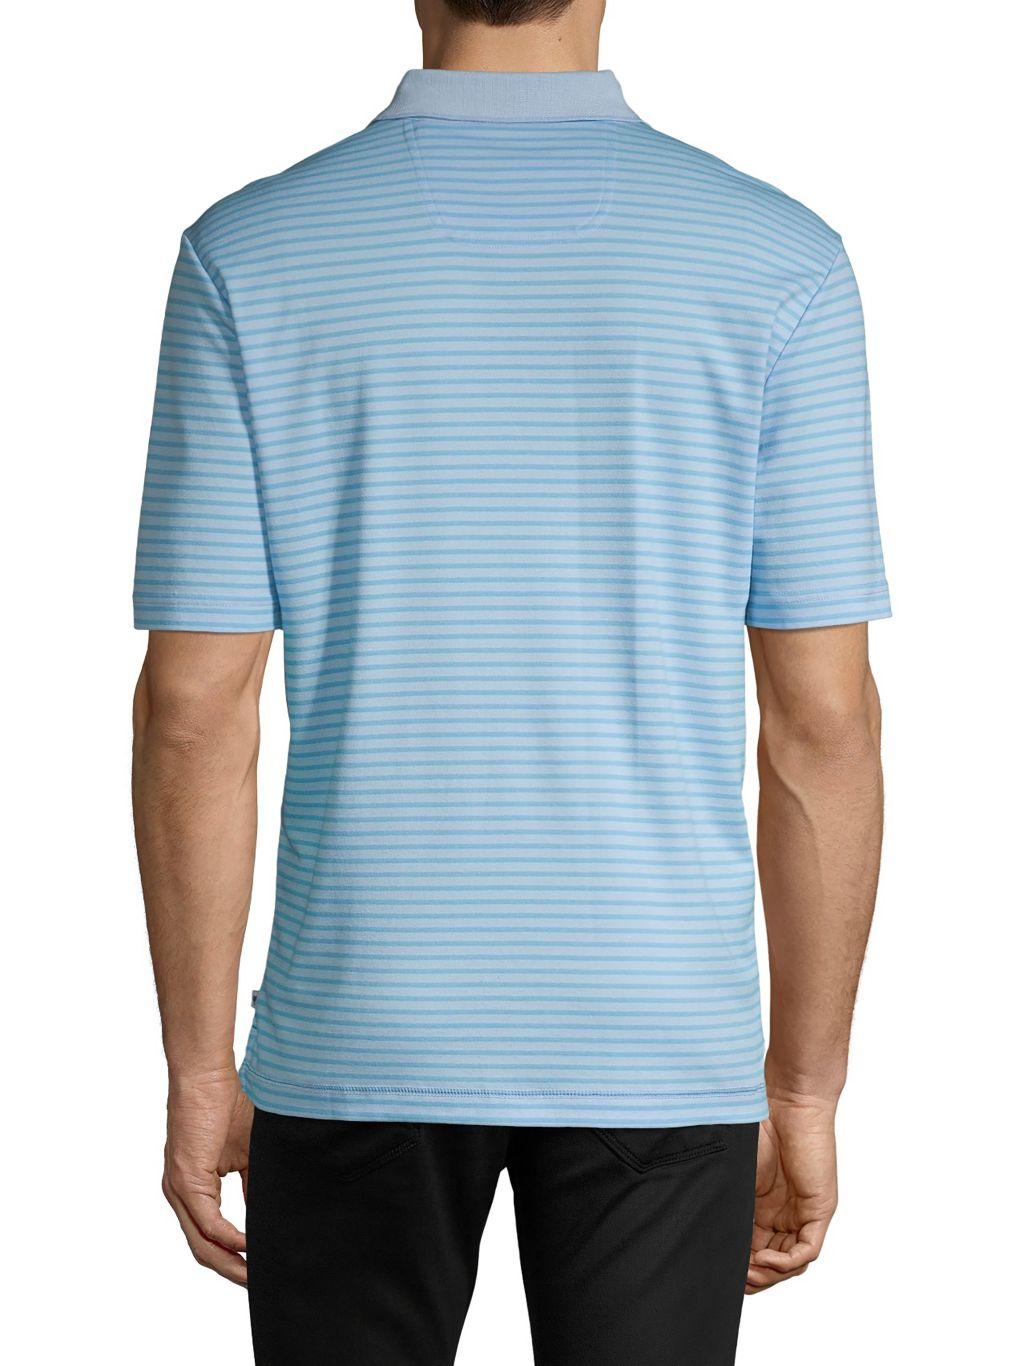 Tommy Bahama Seville Striped Polo Shirt